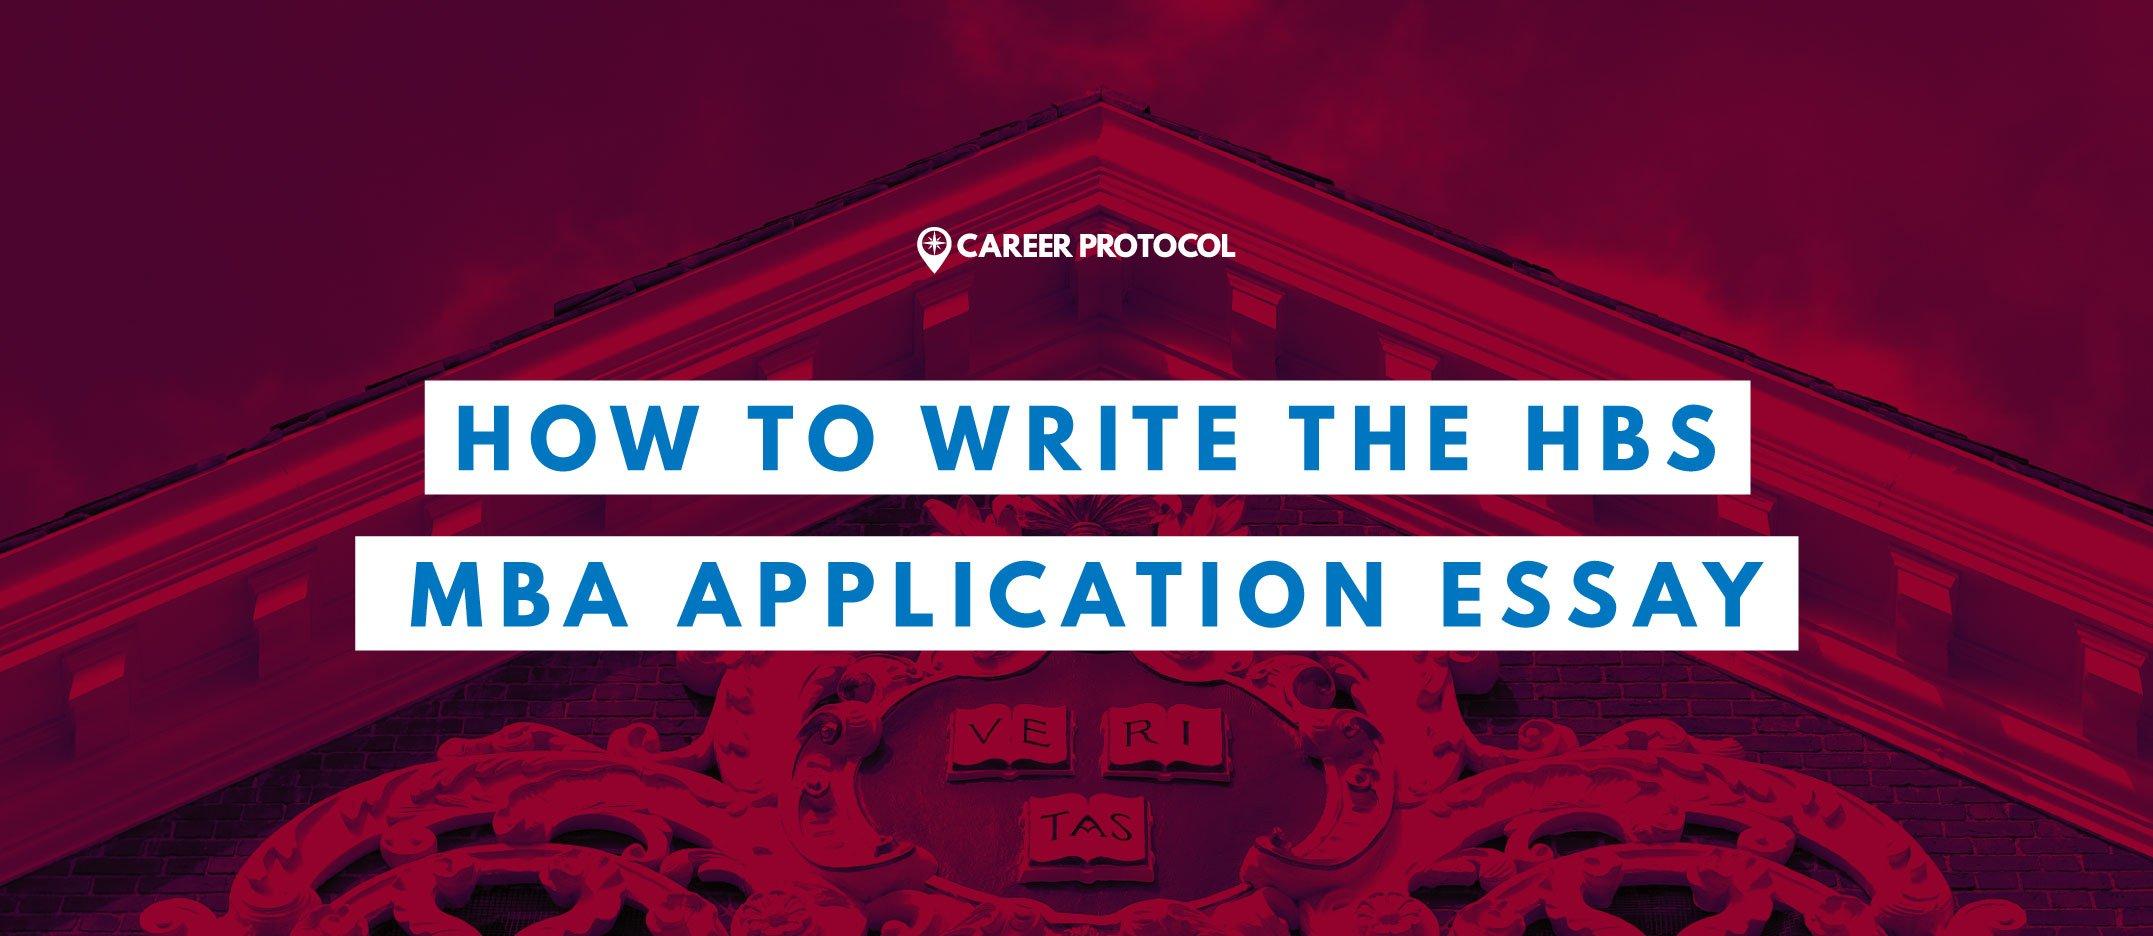 Hbs mba application essay questions essay innovation education